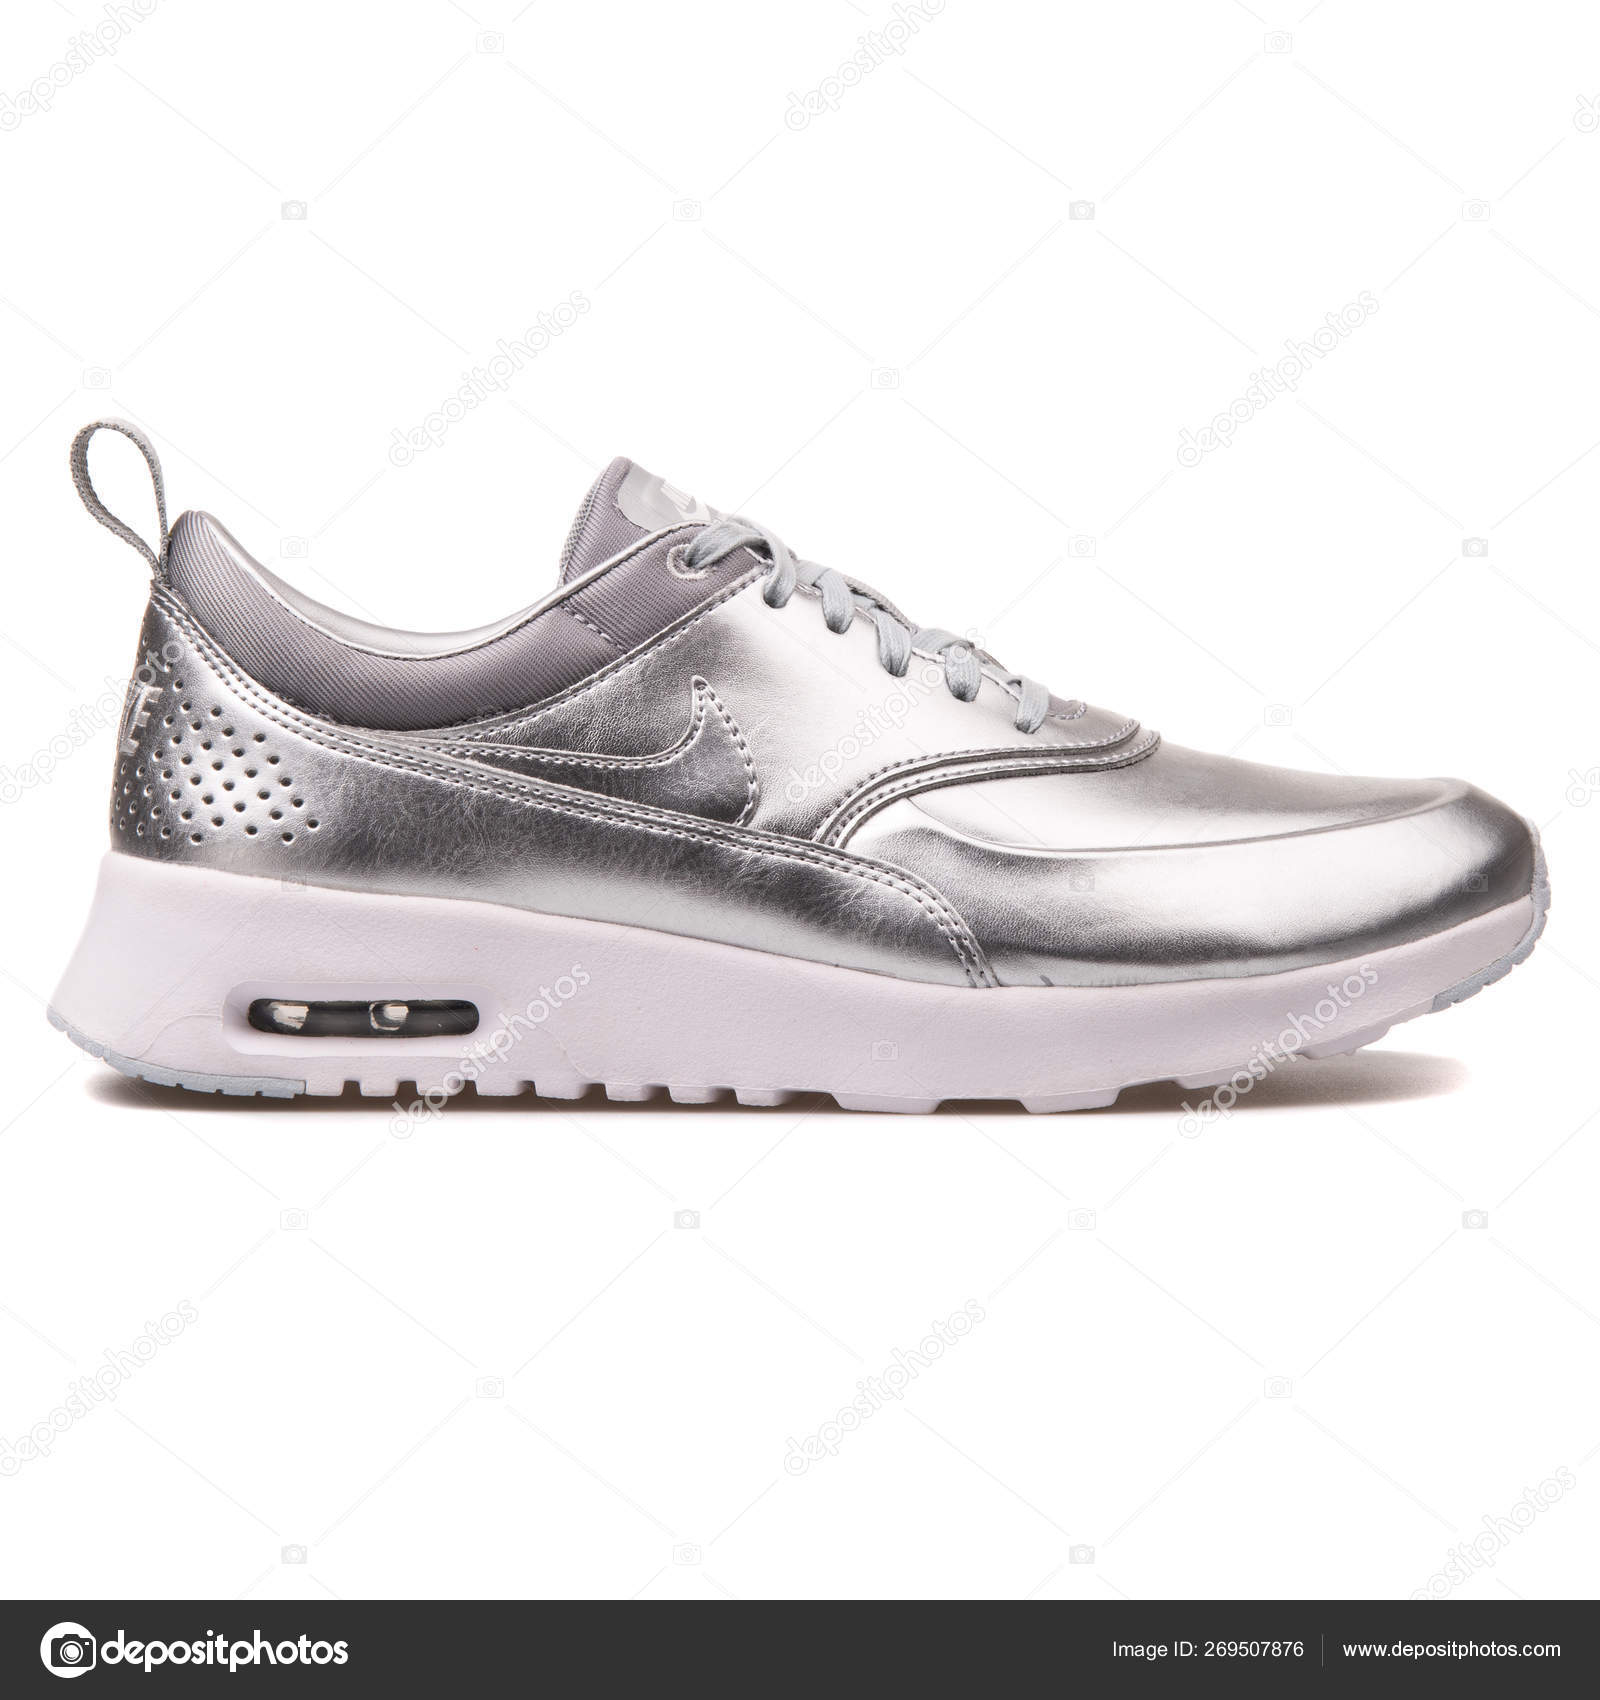 e1b6e199 Nike Air Max Thea Metallic silver sneaker – Stock Editorial Photo ...